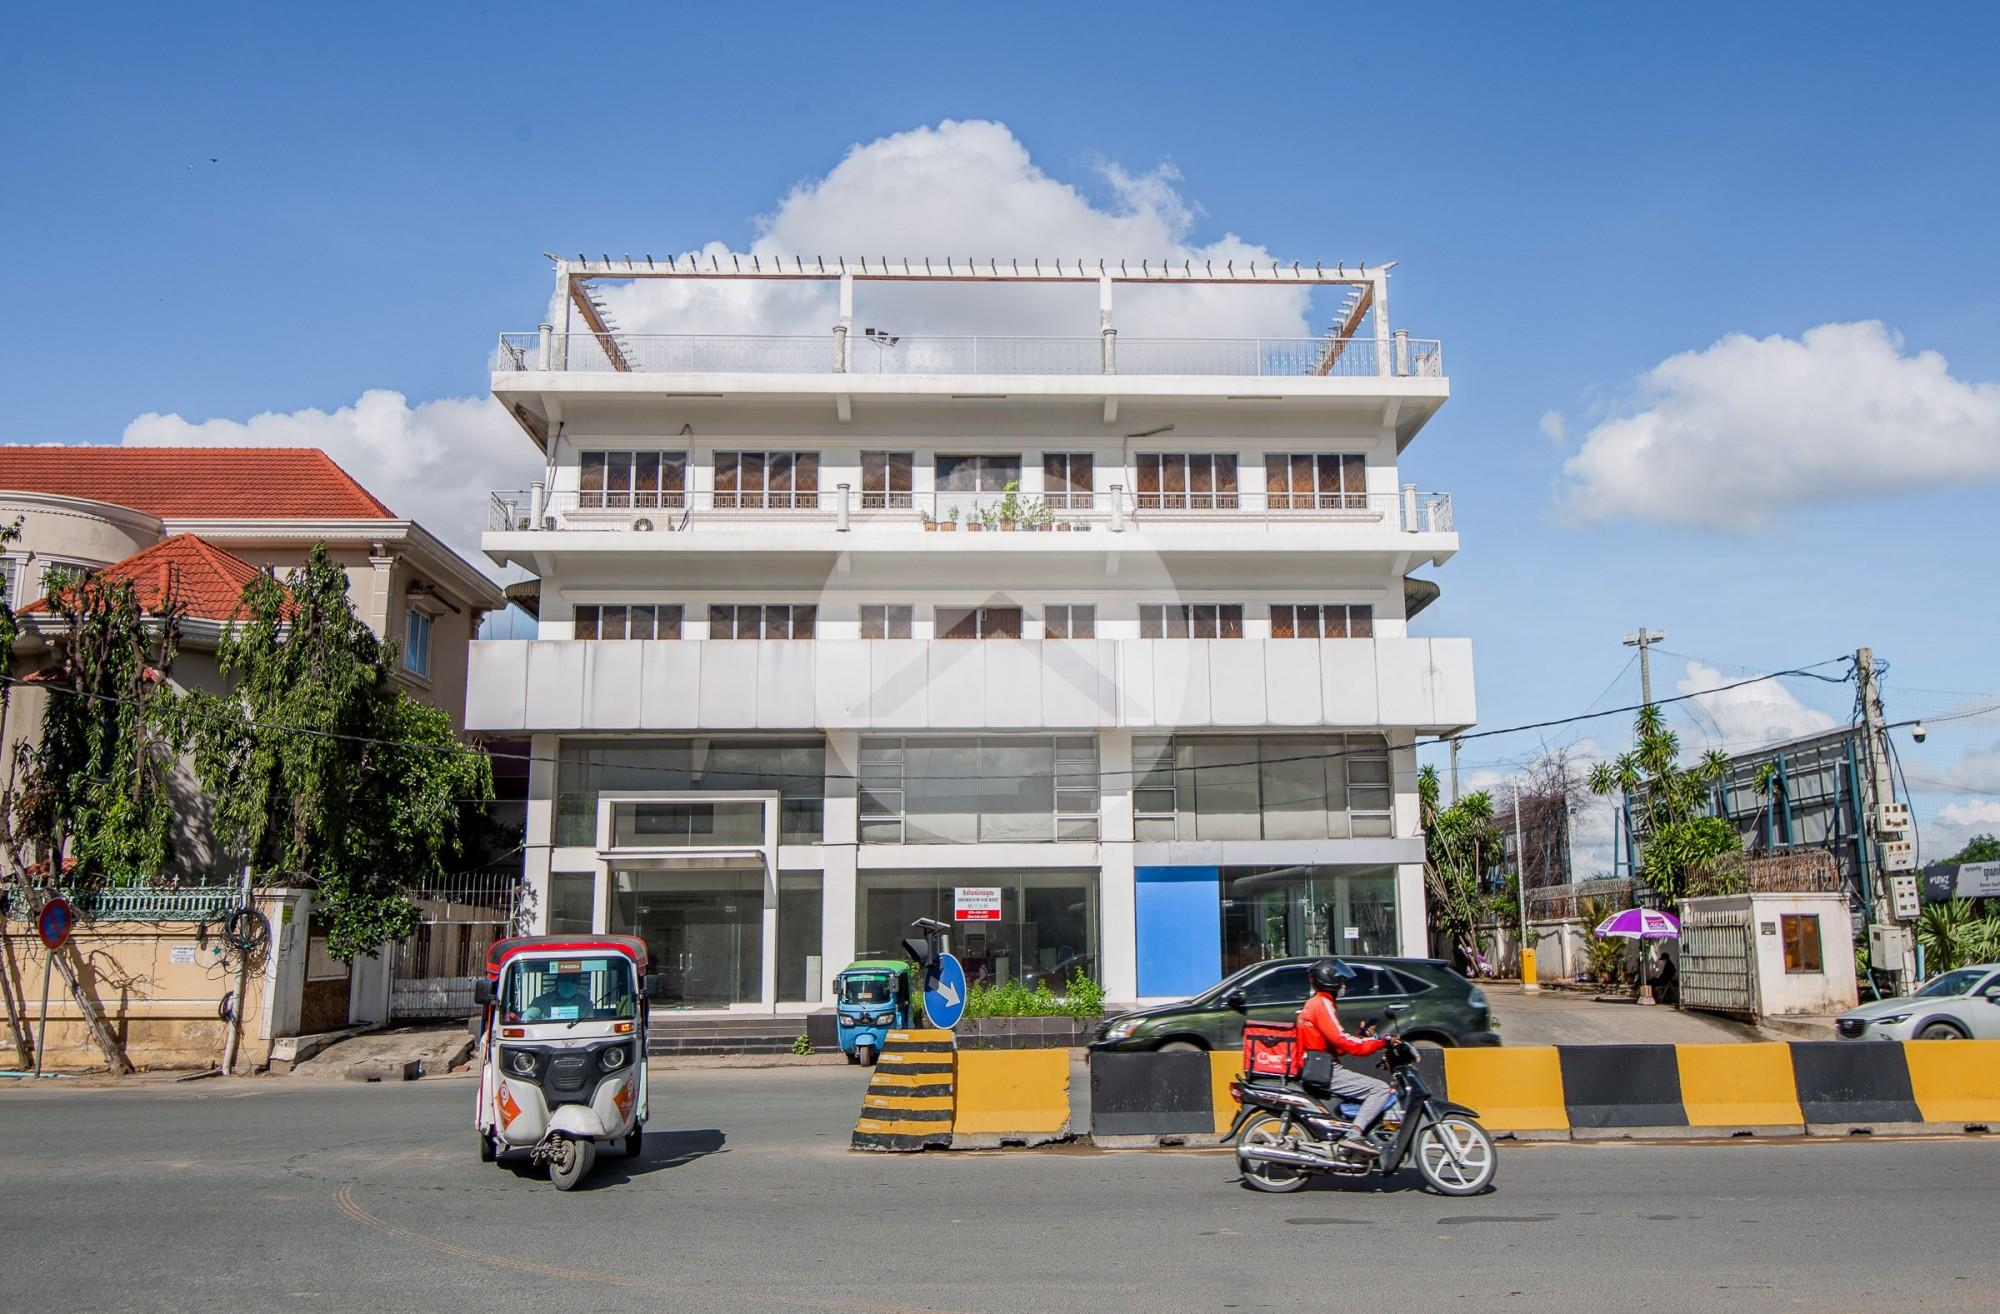 2767 Sqm Commercial Land For Sale - Norodom BLVD, Phnom Penh